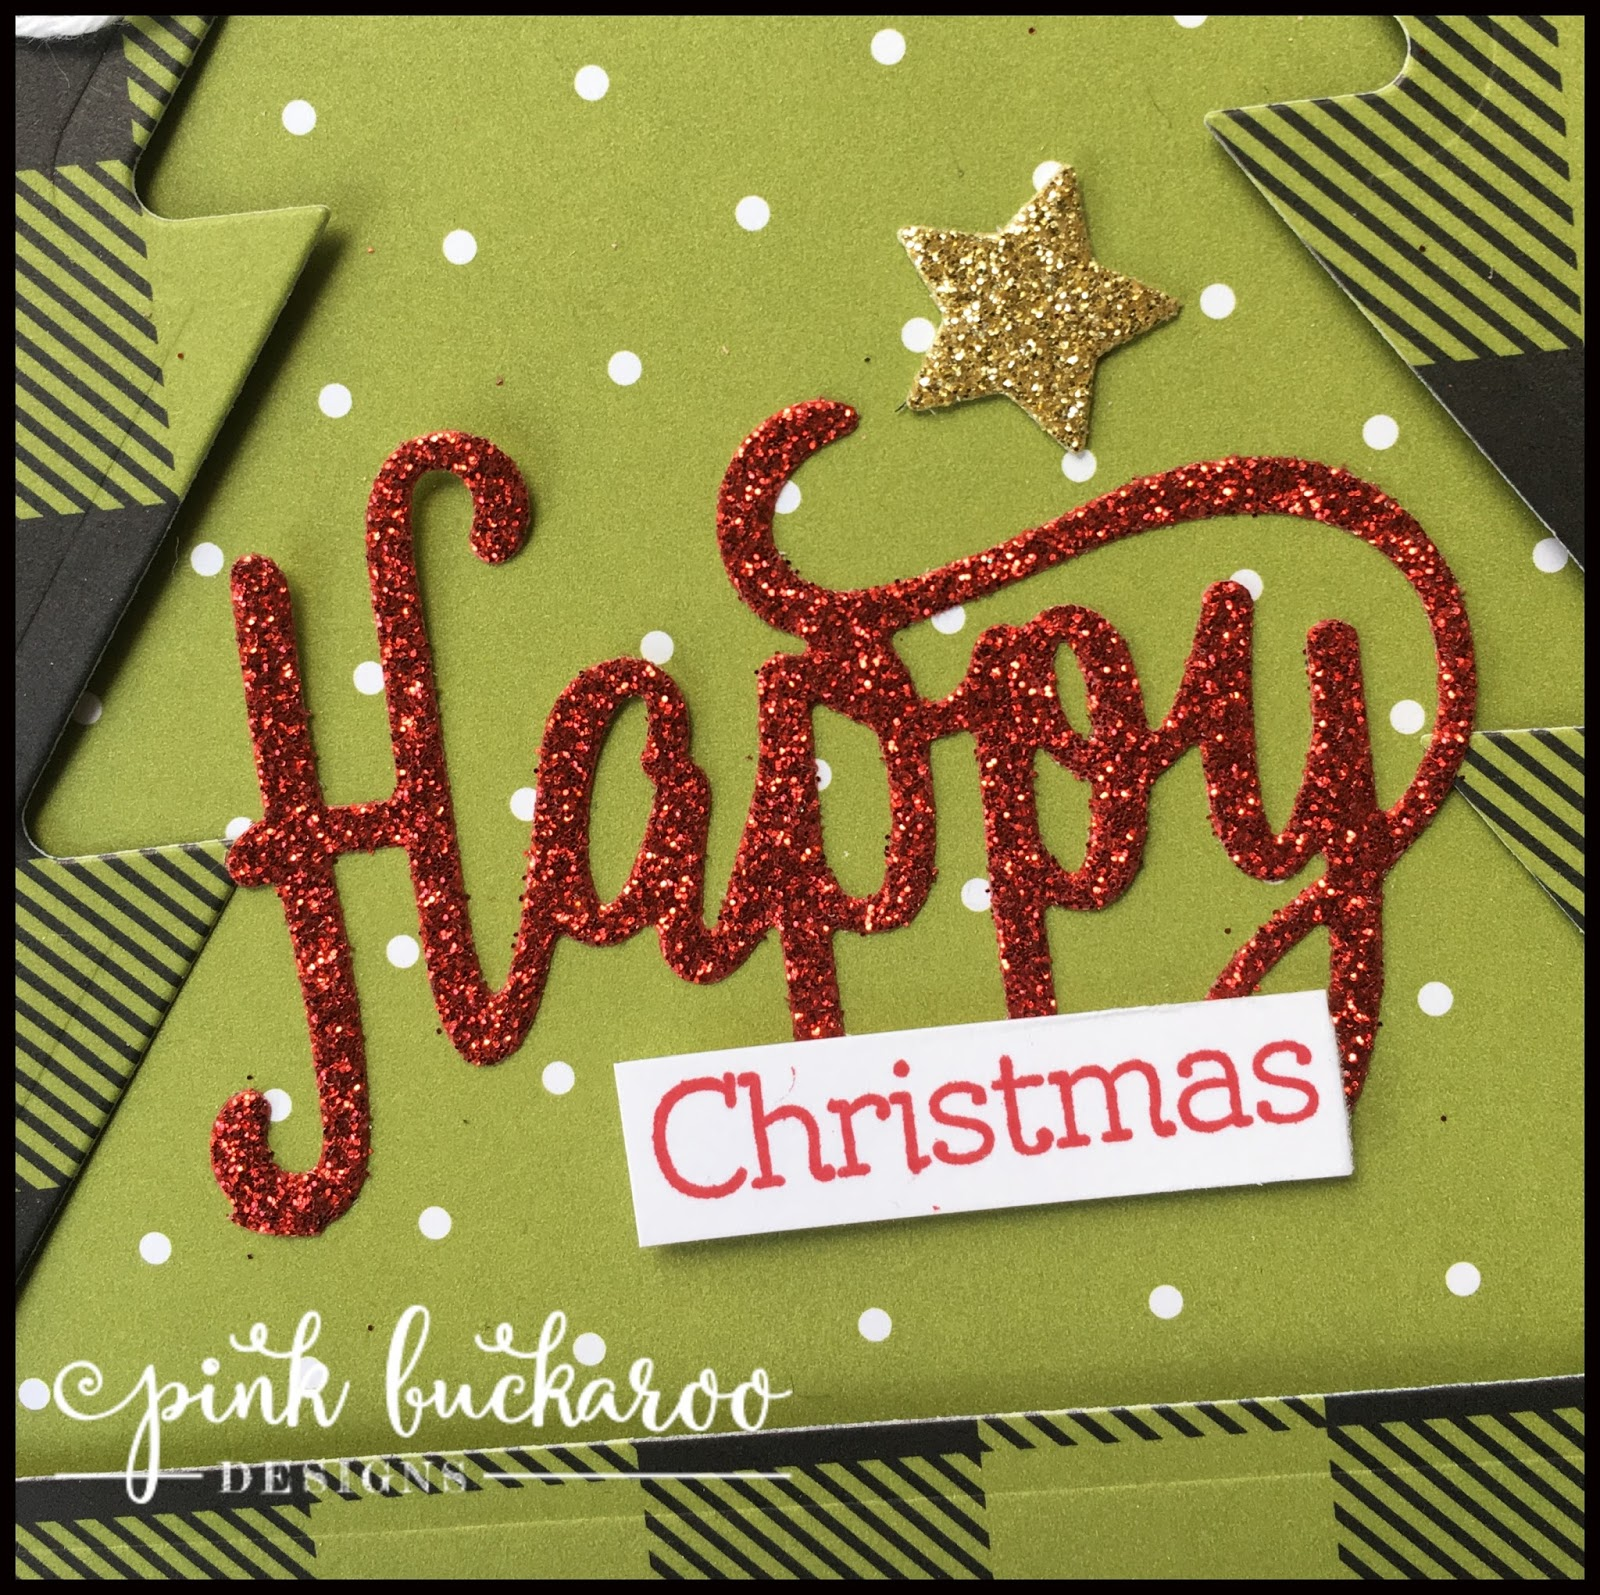 Happy Birthday Christmas Dsc 9499r Elves Shelves And